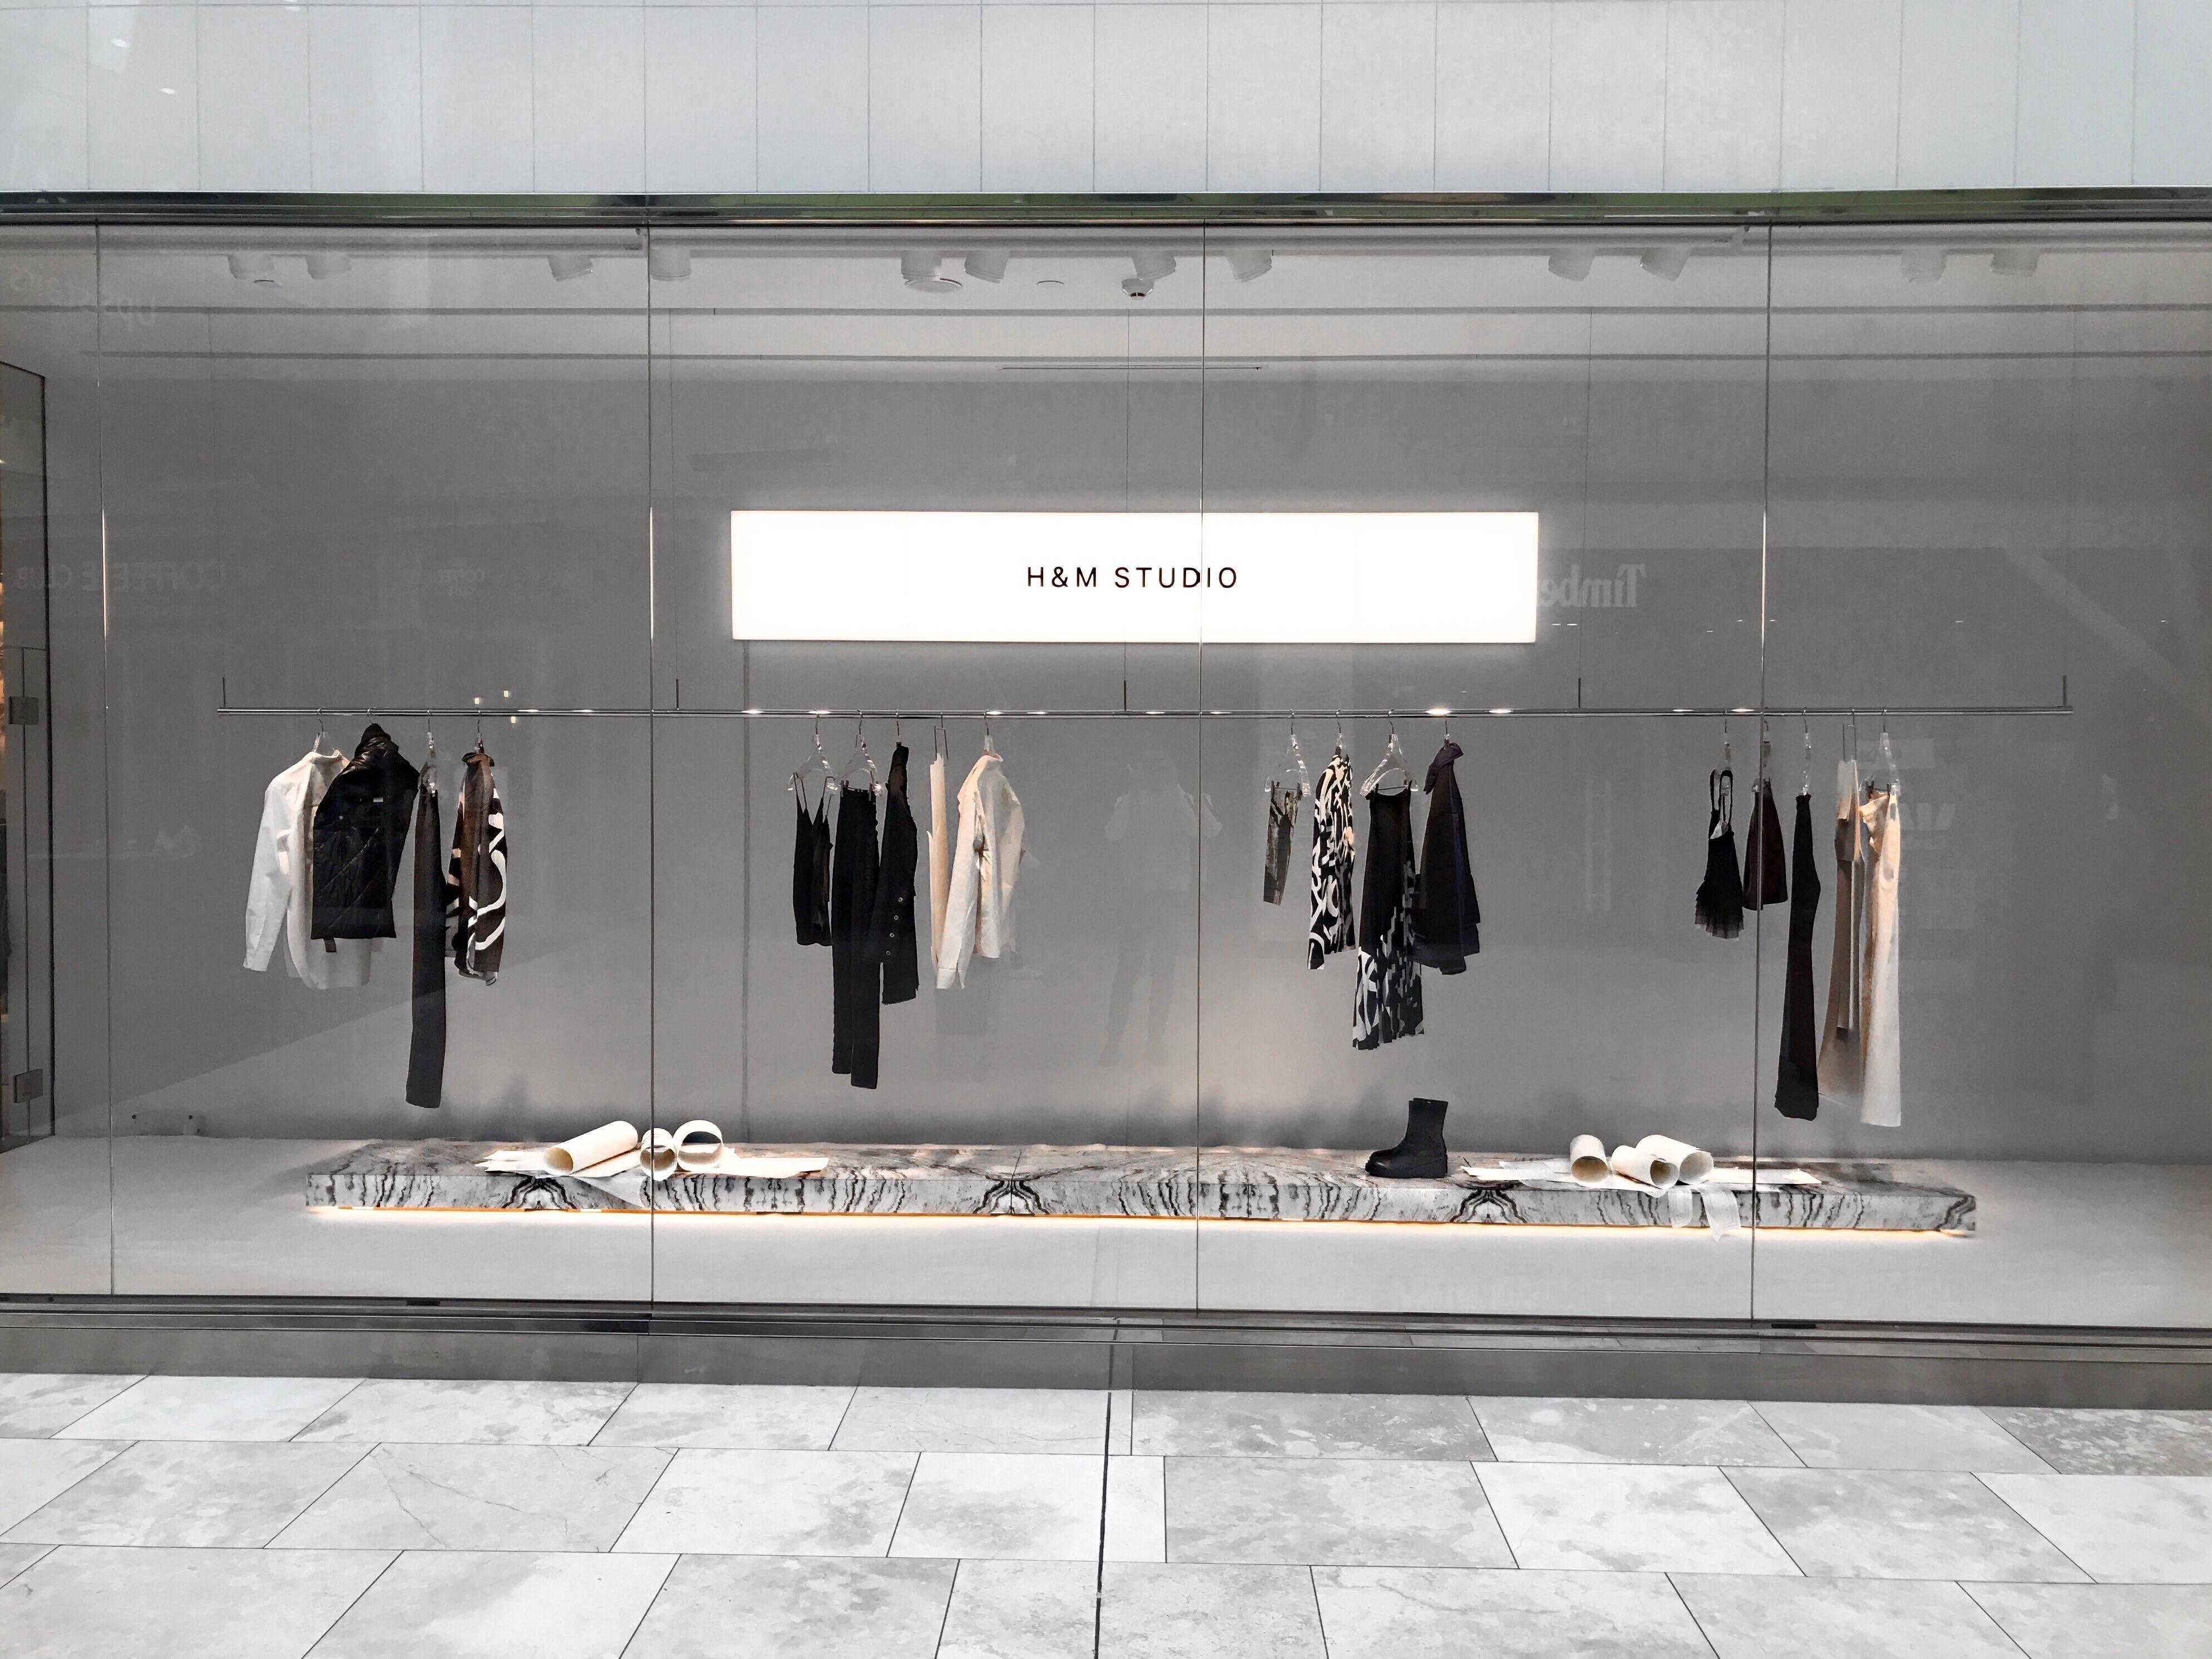 Socle Un Peu Recule De La Vitrine Central Retail Store Design Shop Interior Design Store Design